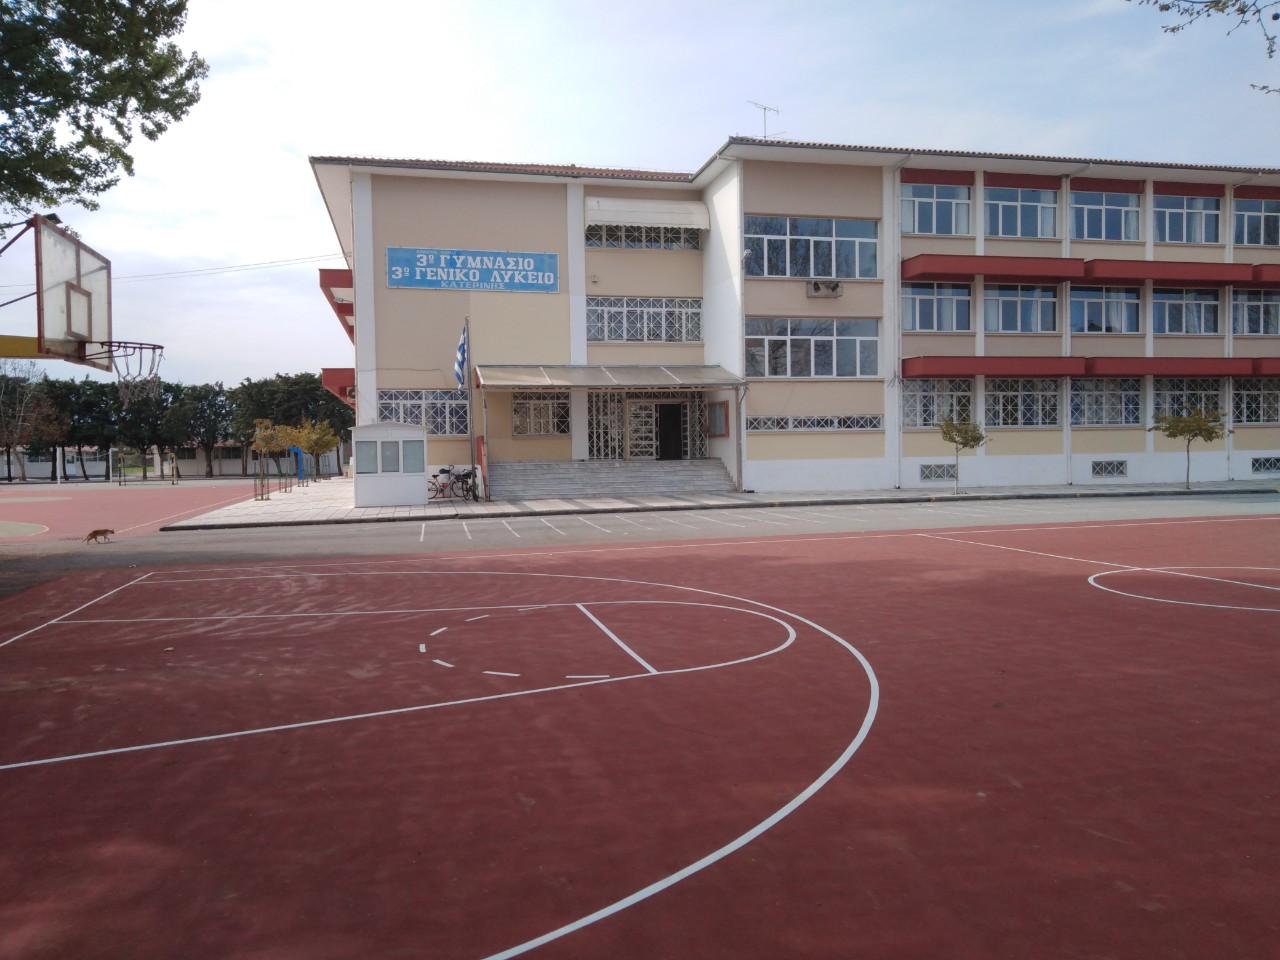 Tο 3ο Γενικό Λύκειο συγχαίρει τους επιτυχόντες μαθητές του σχολείου